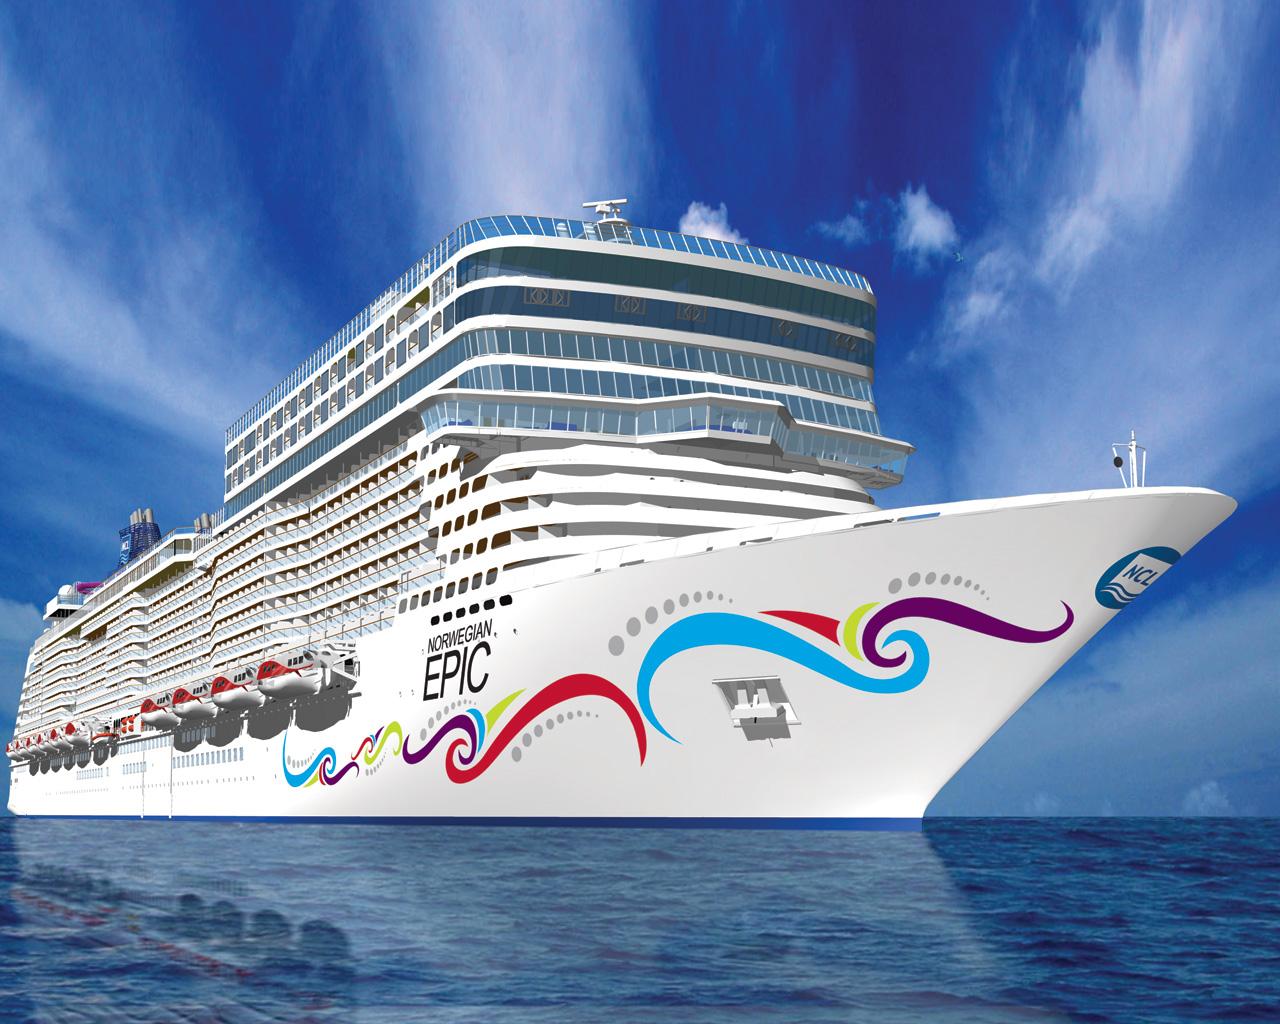 http://4.bp.blogspot.com/-nQCpMzEvMAw/TcZ1ACscjMI/AAAAAAAAAHk/RC633hlhYyo/s1600/Royal+Caribbean+Cruises+New+%252814%2529.jpg